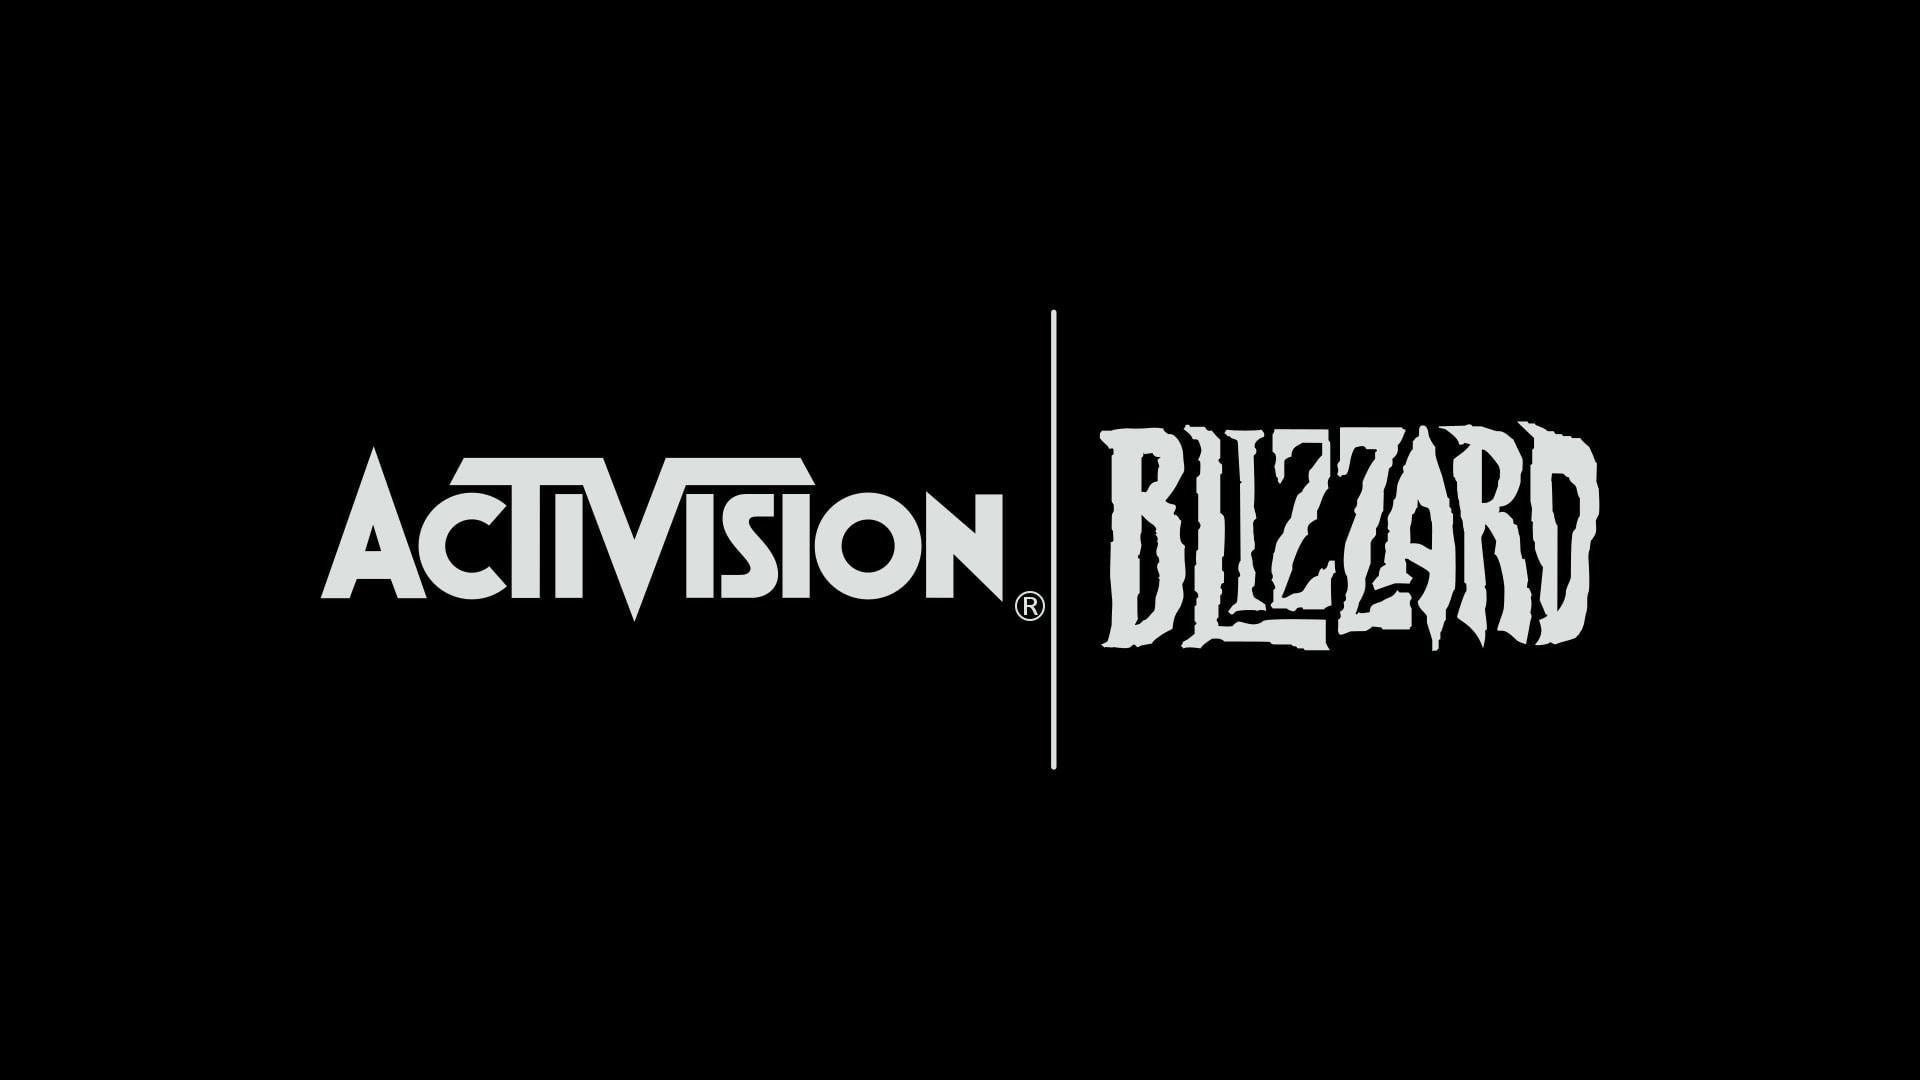 Activision, Blizzard